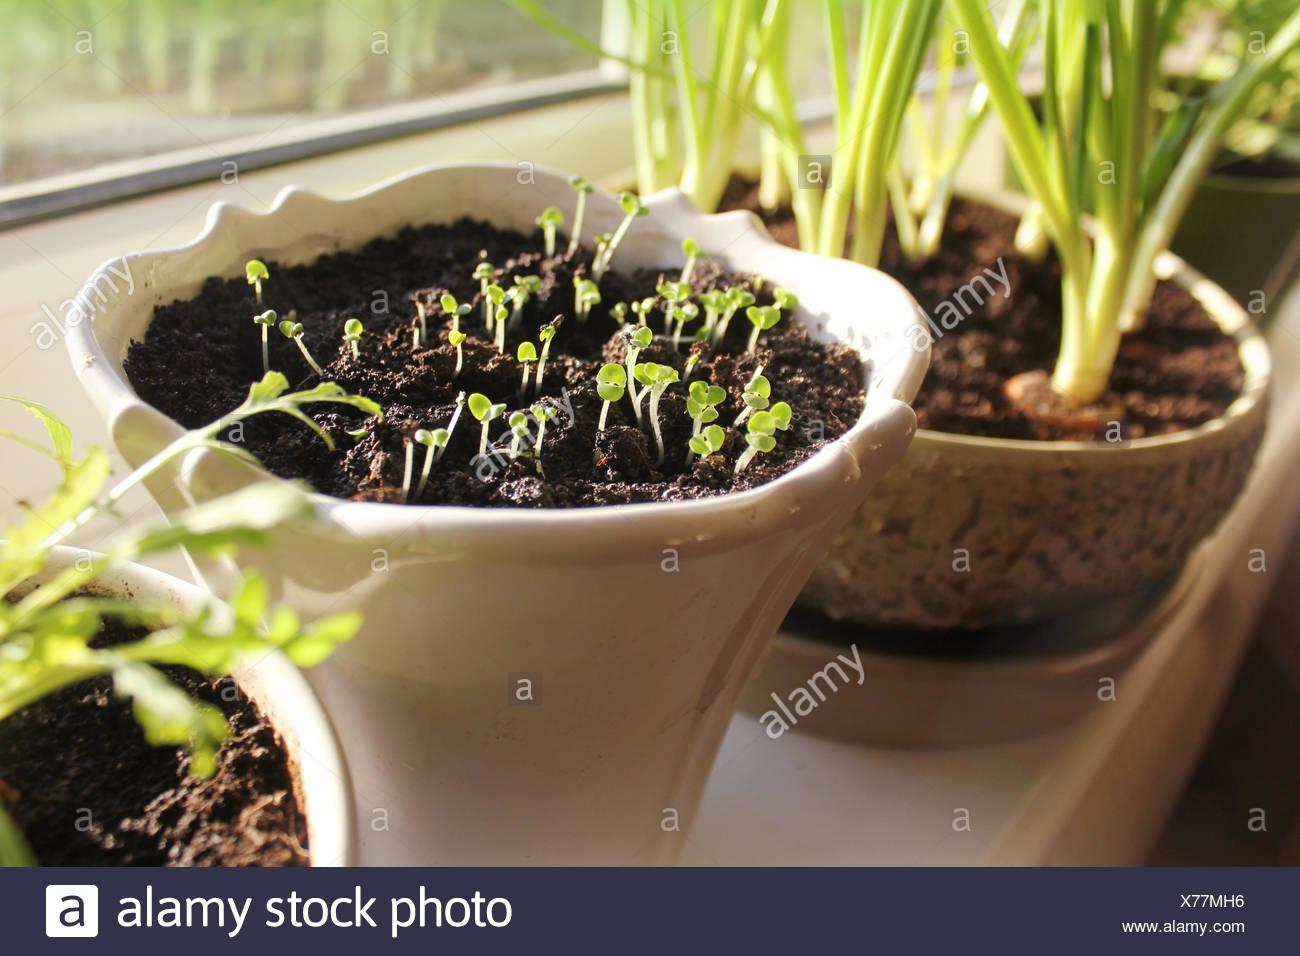 Basil Plant On Kitchen Windowsill Stock Photos & Basil Plant On ...